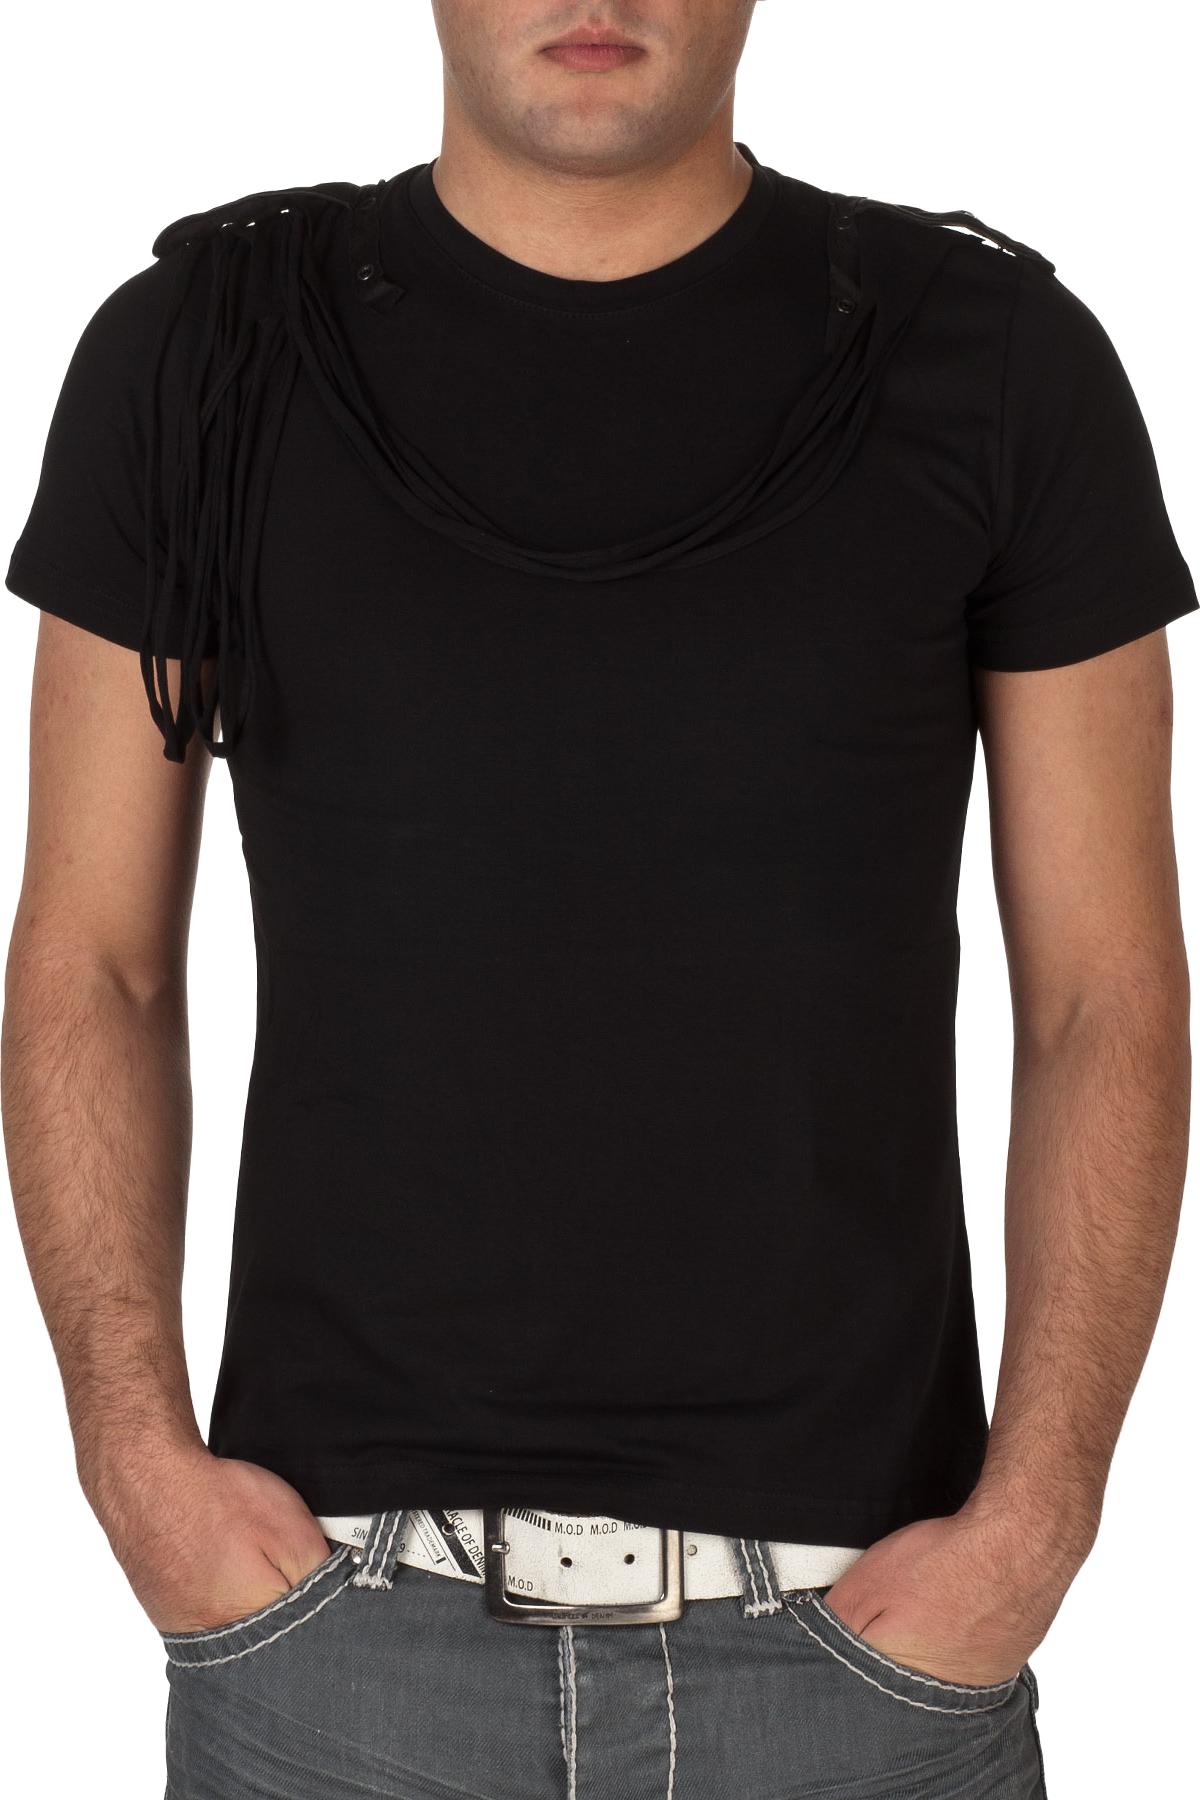 Black Men's Polo Shirt